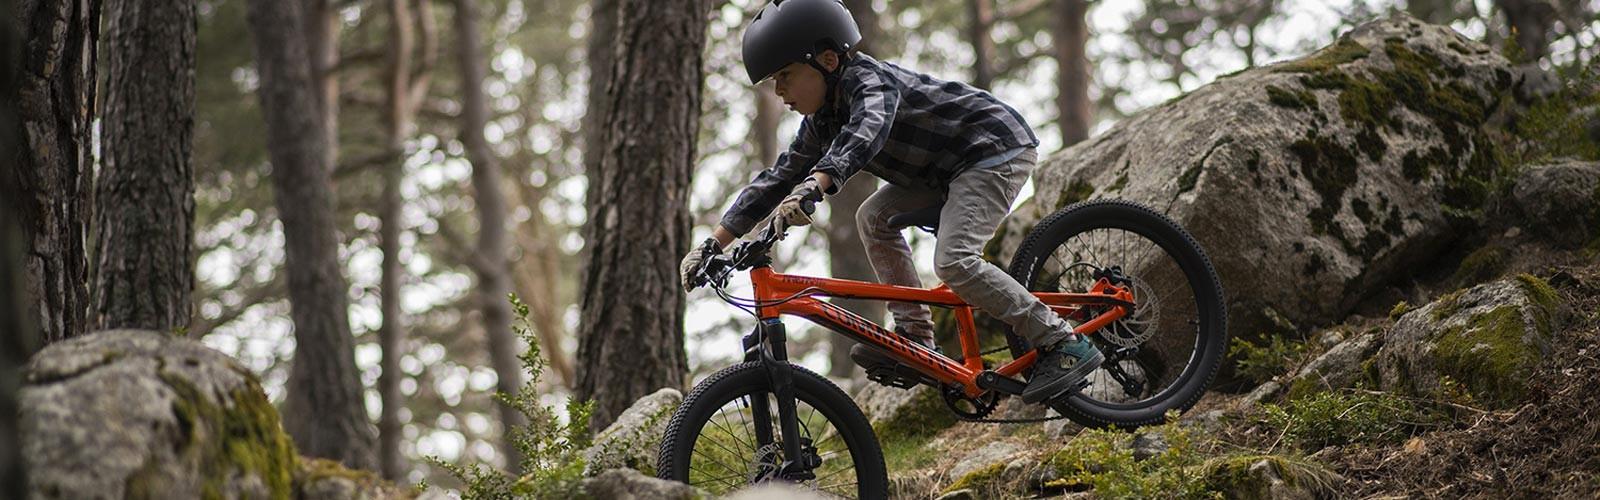 Vélo et VTT enfant